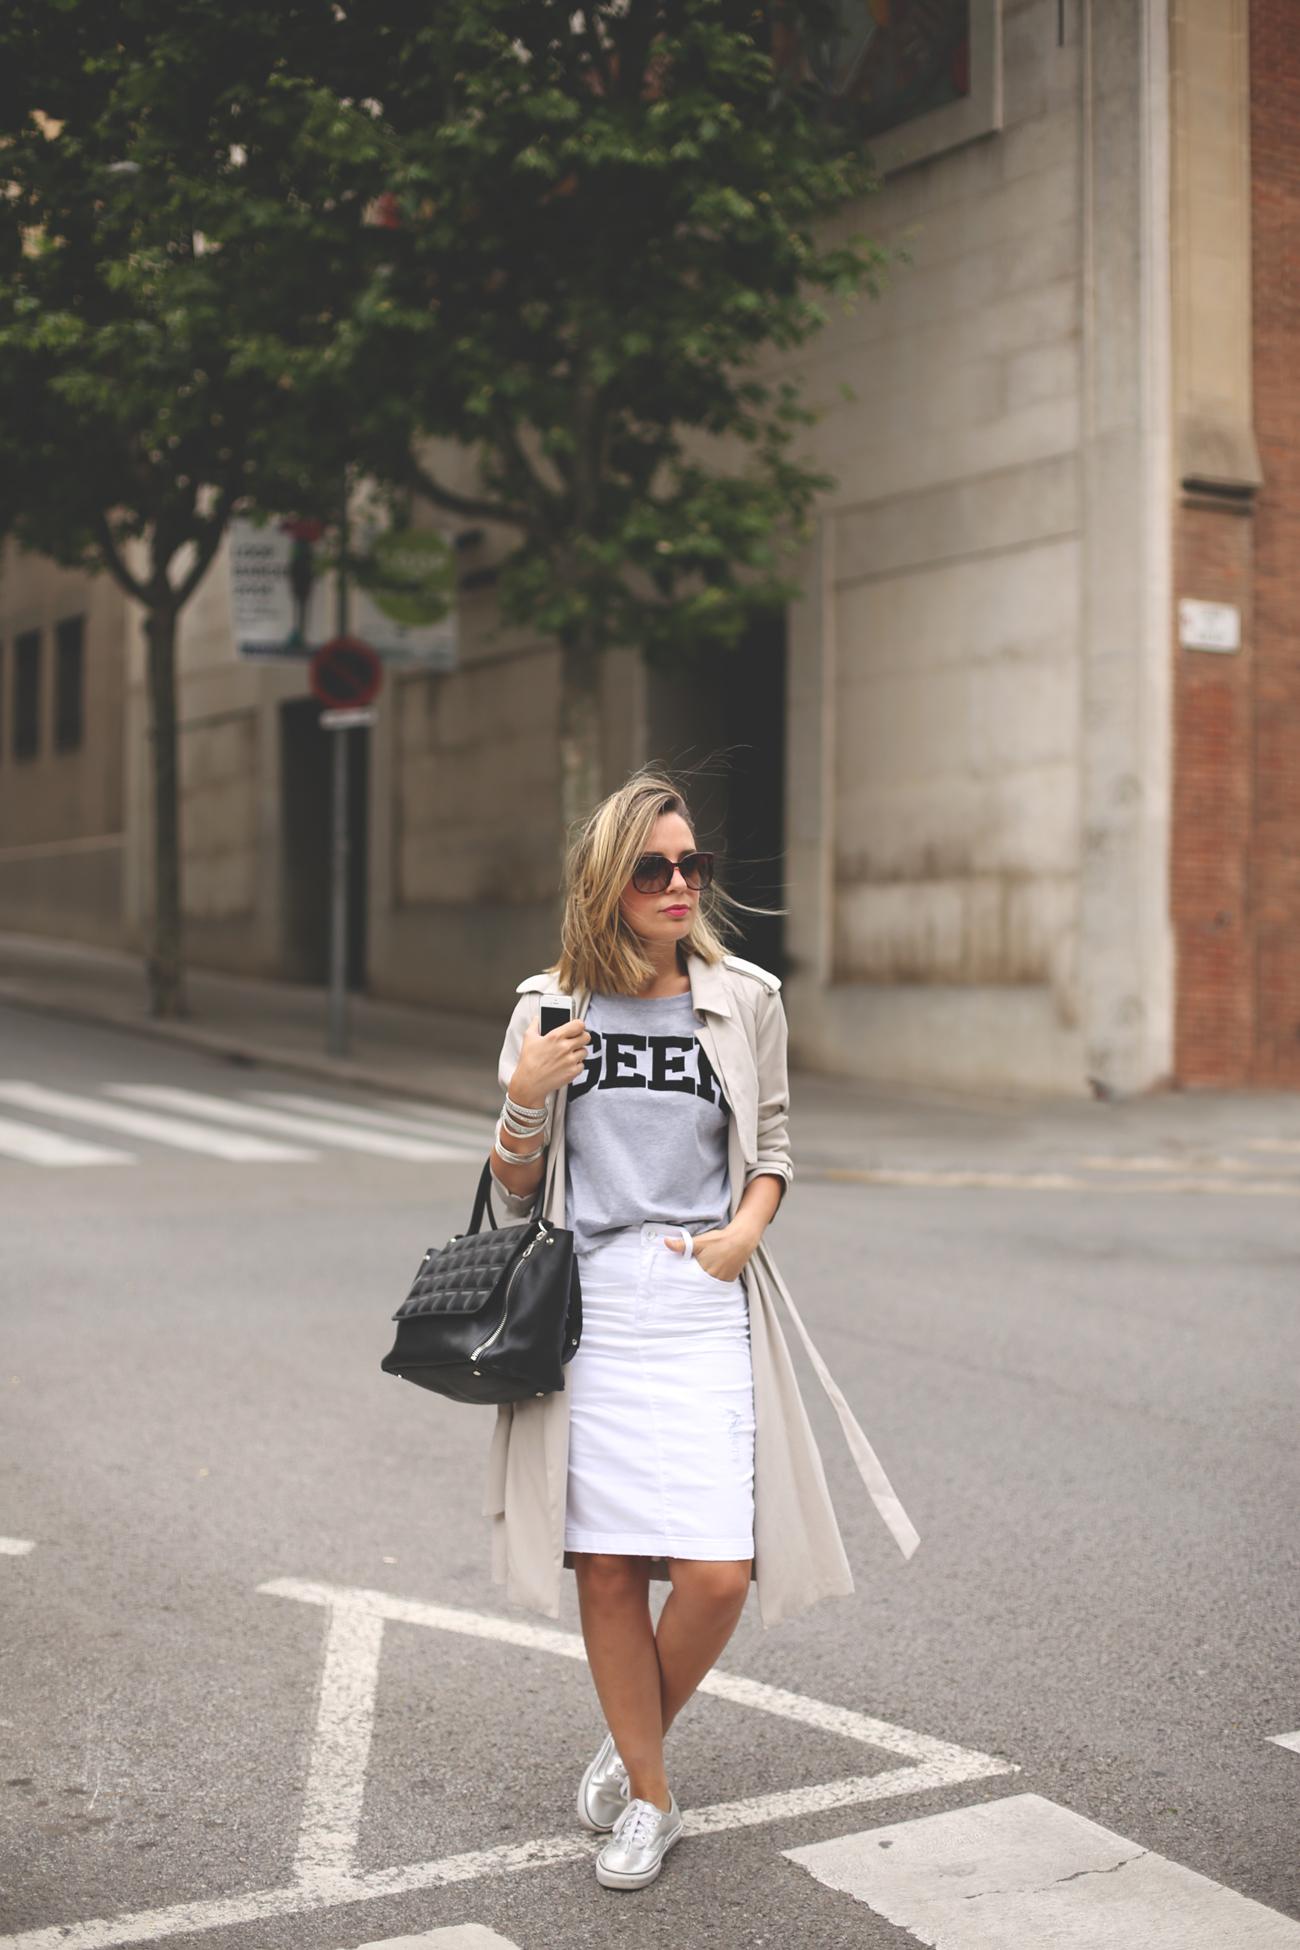 Trench, priscila betancort, fashion blog, street style, spanish blogger, white skirt, look con falda, vans plata, blonde girl,